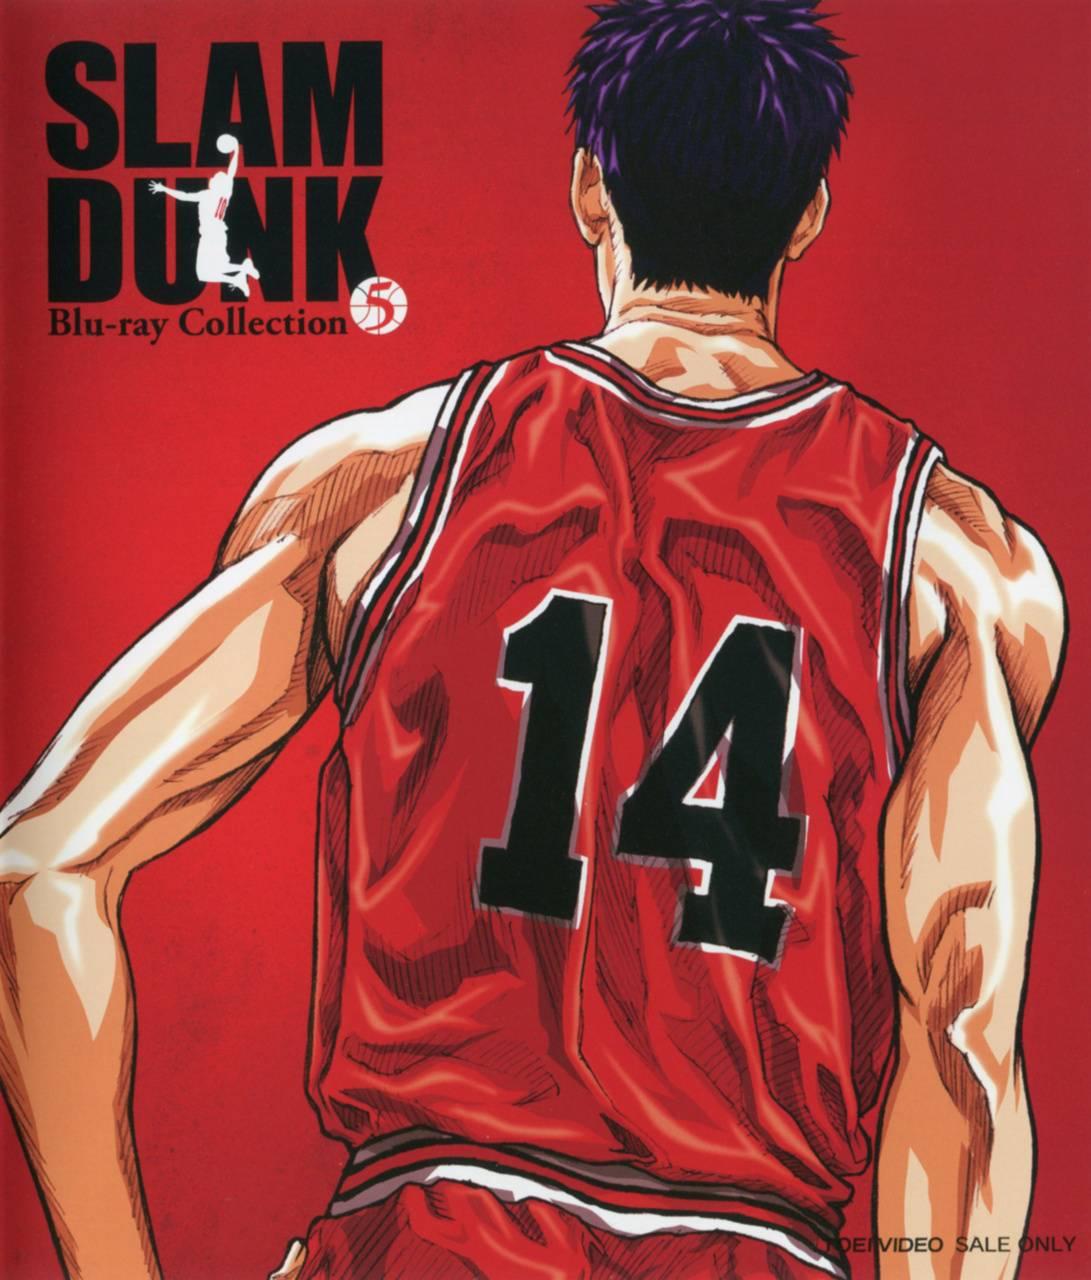 Mitsui Slam Dunk